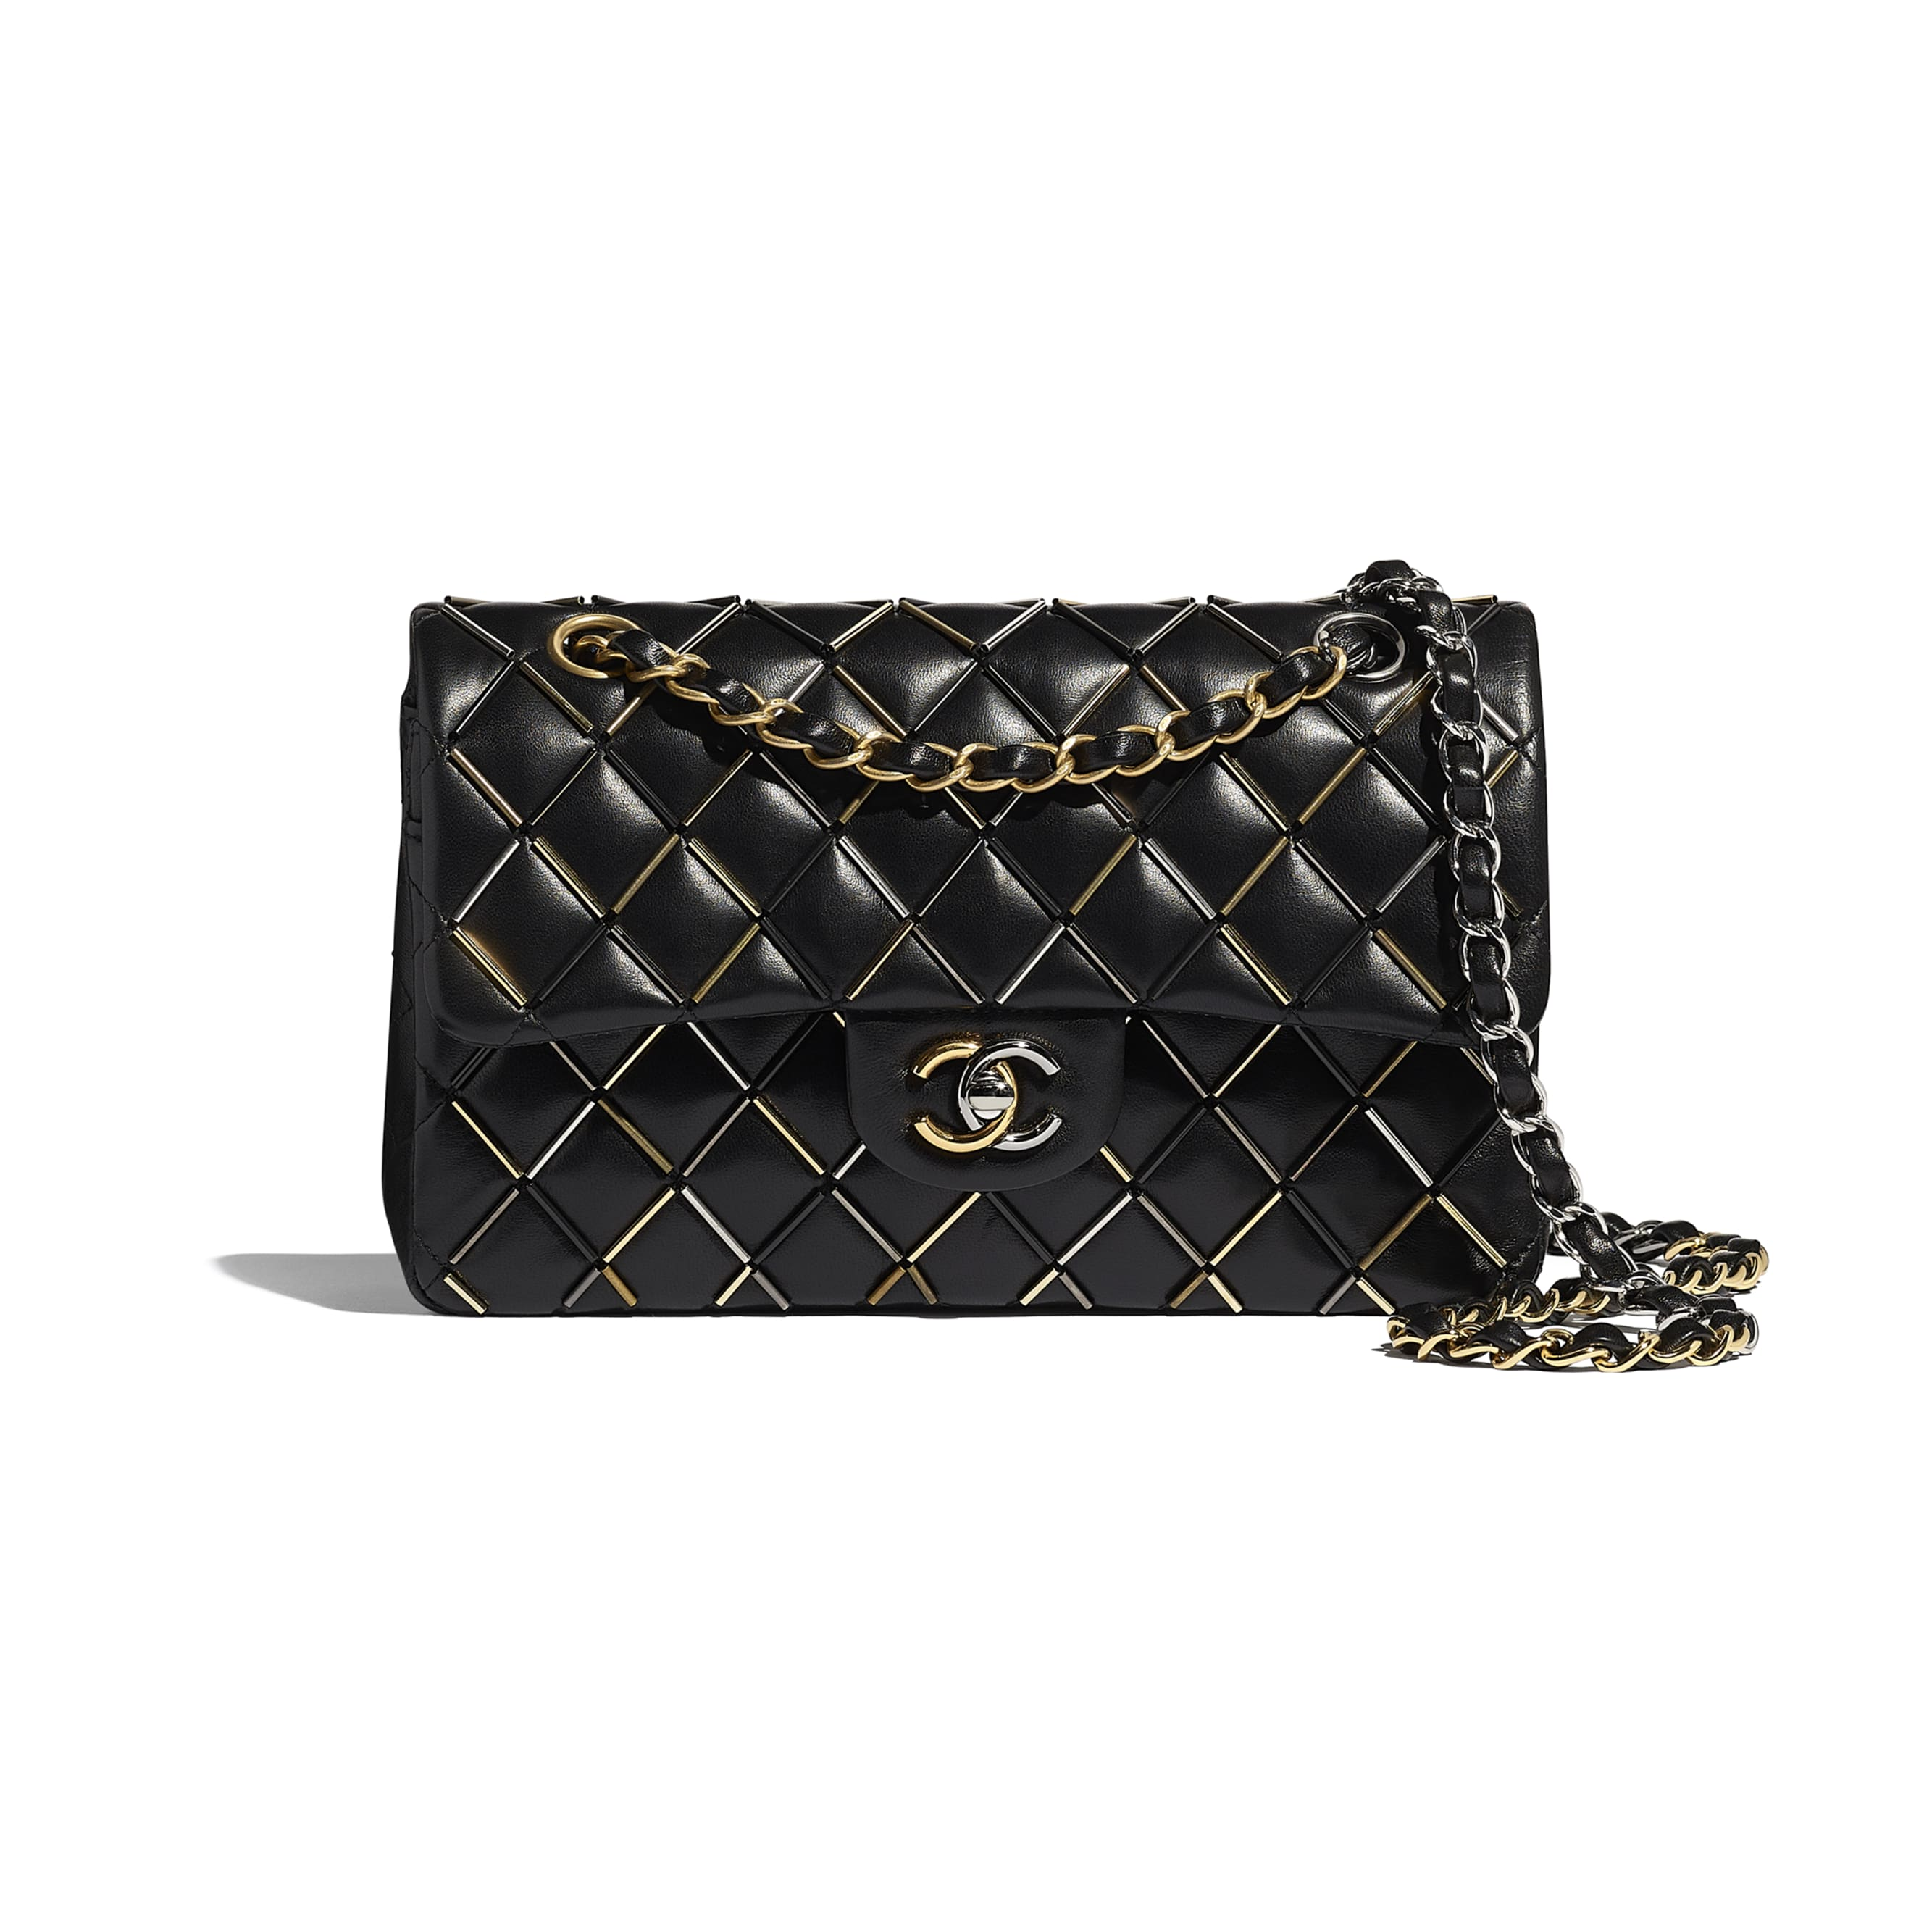 Classic Handbag - Black - Lambskin, Gold-Tone, Silver-Tone, Black & Ruthenium-Finish Metal  - Default view - see standard sized version